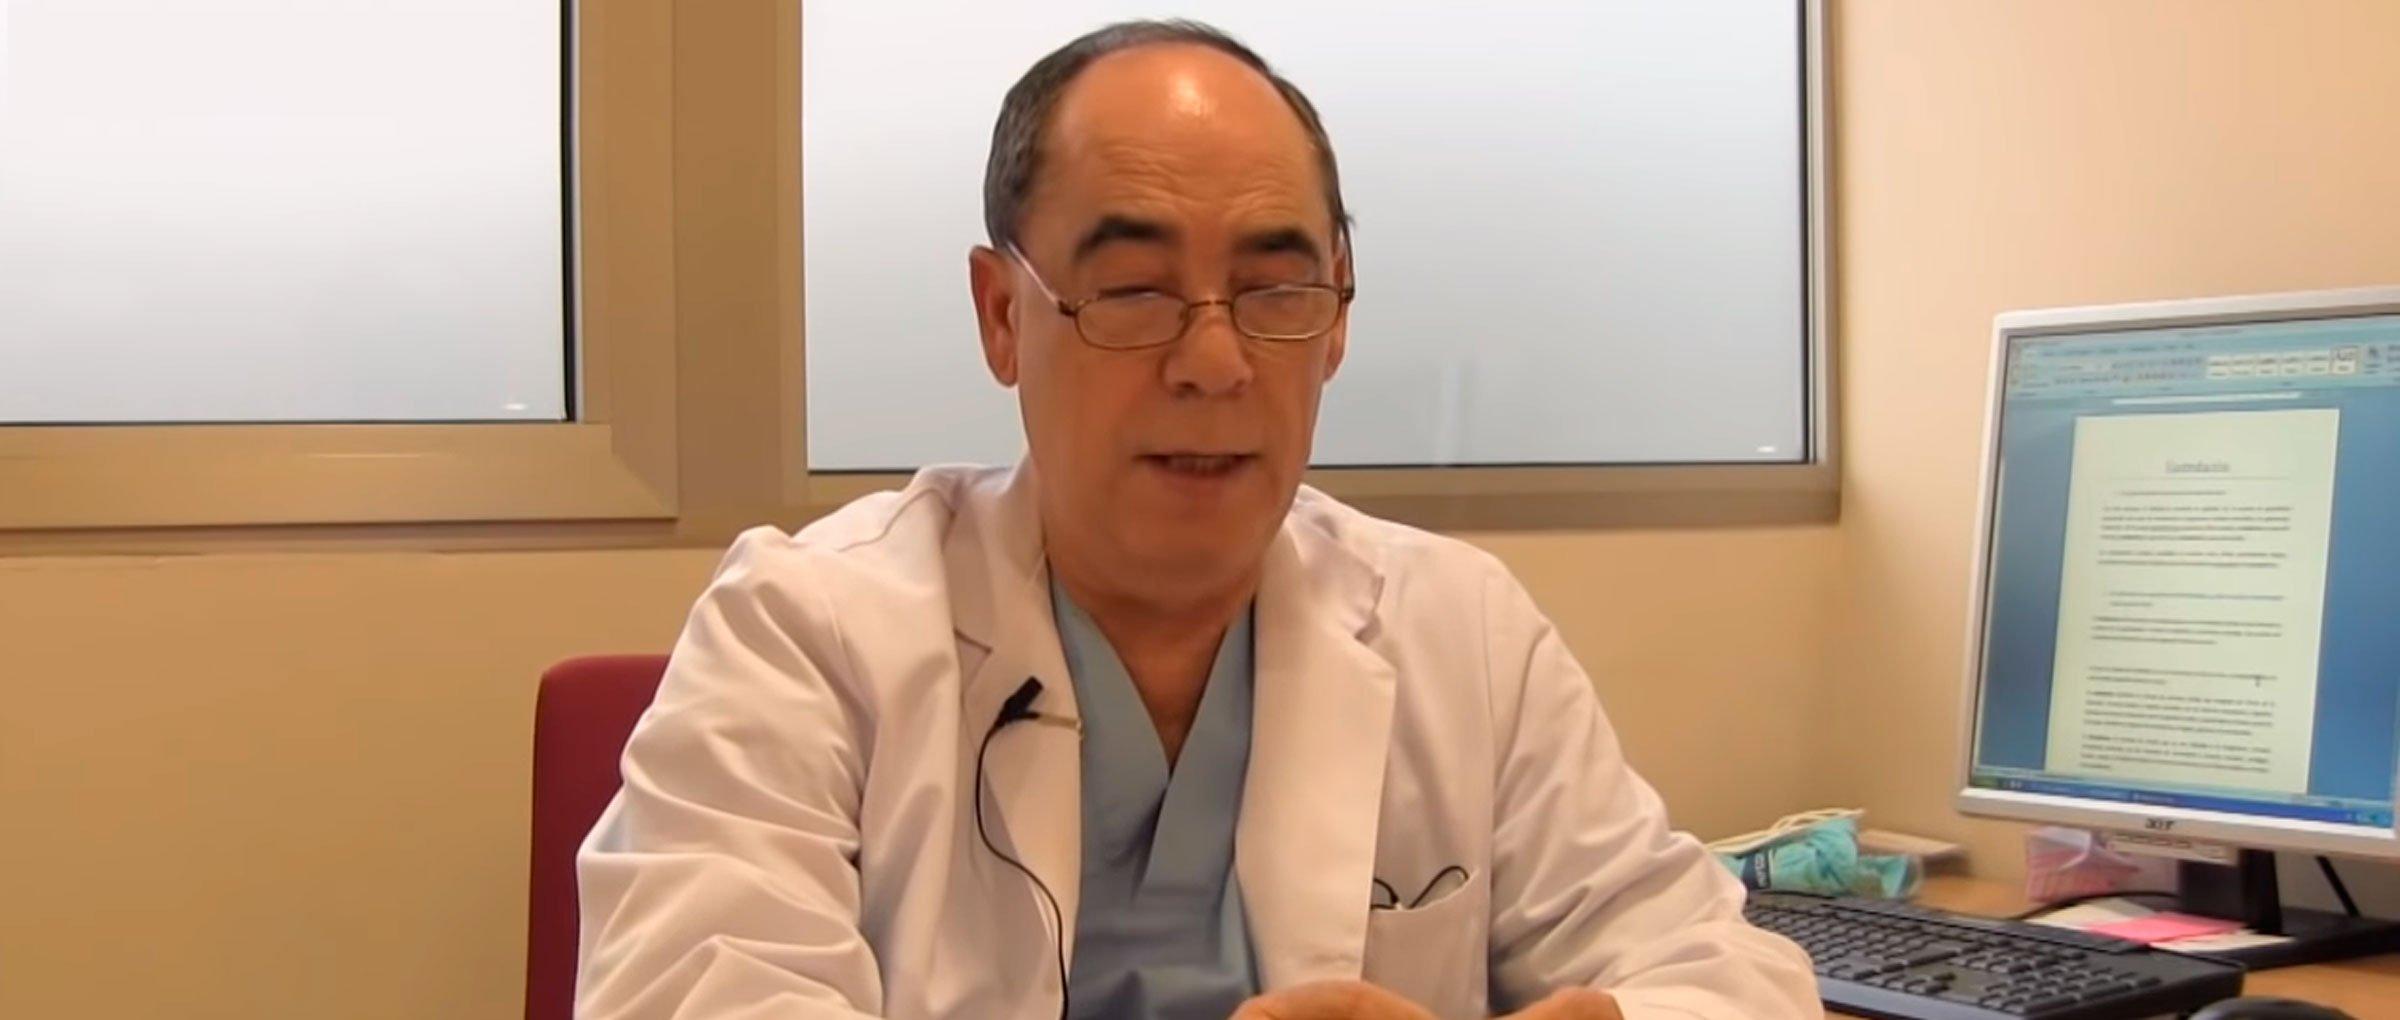 Imagen: Interview of Dr Barea